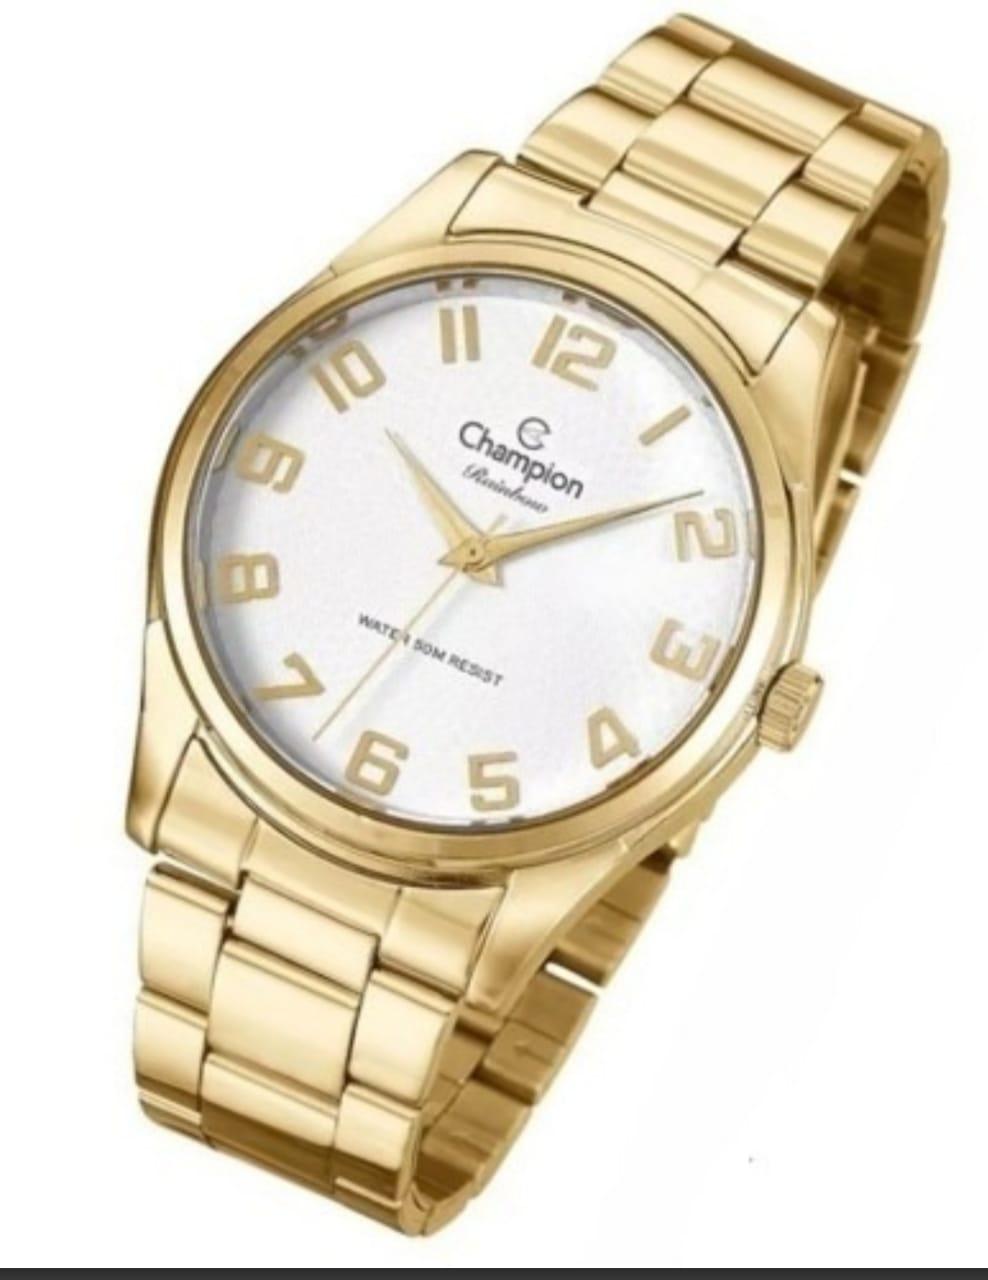 8f6b7453a04 Relógio Feminino Champion Dourado CN29883J - DR JOIAS